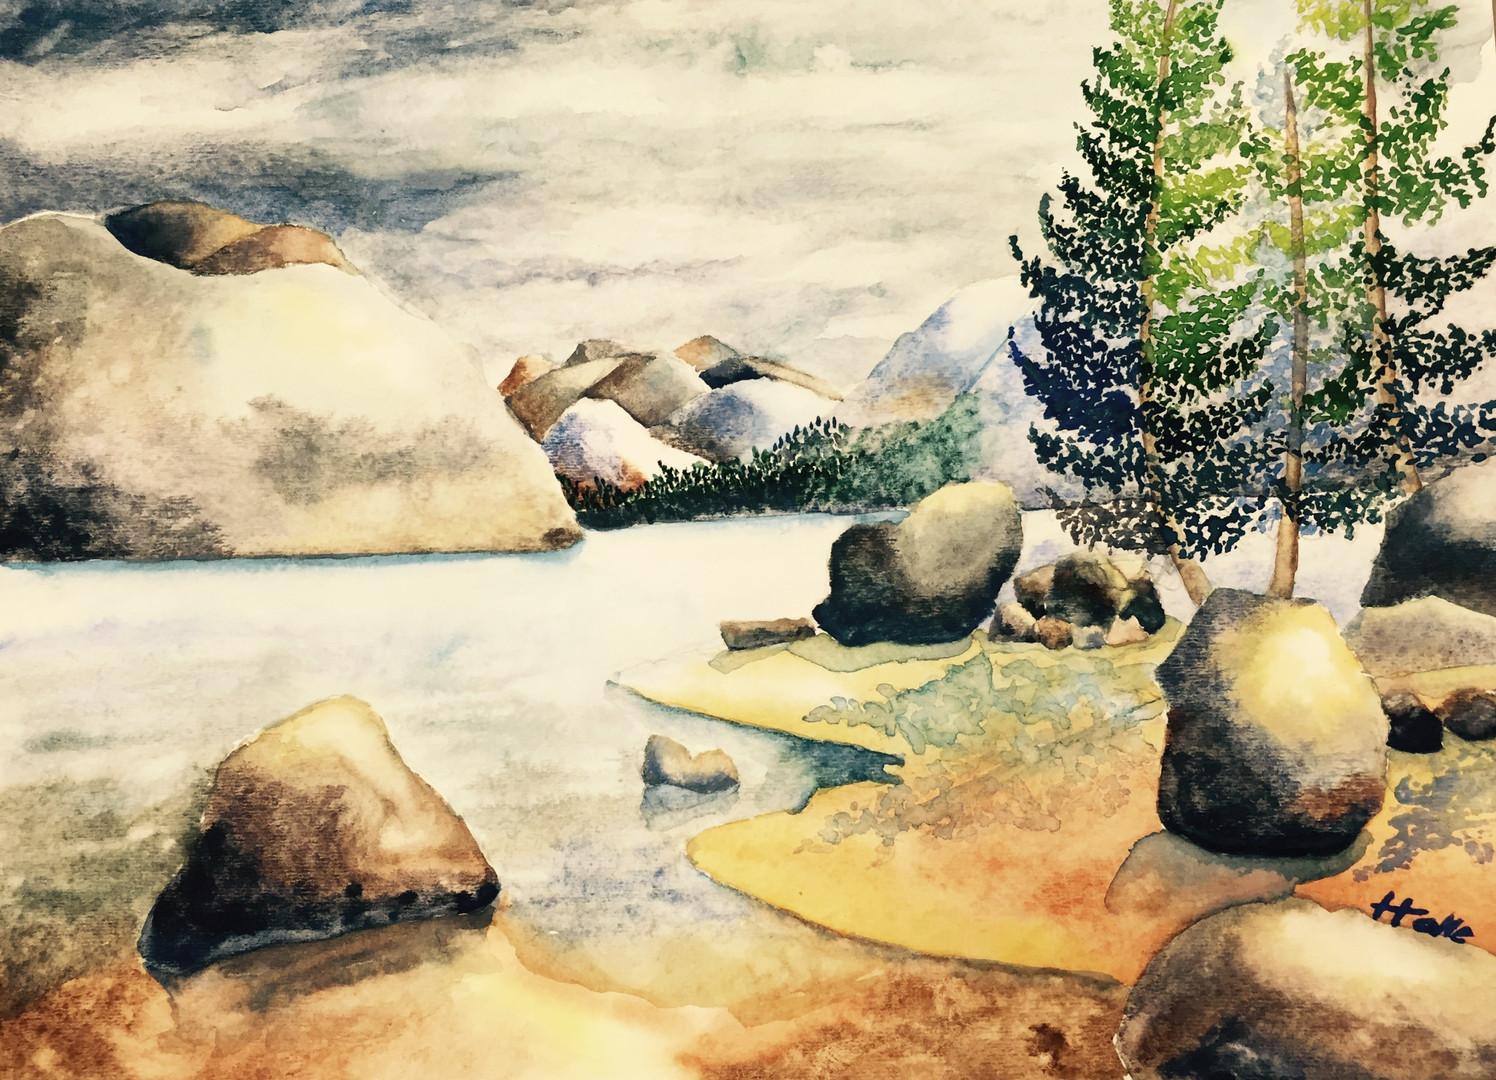 000_Watercolor.jpg